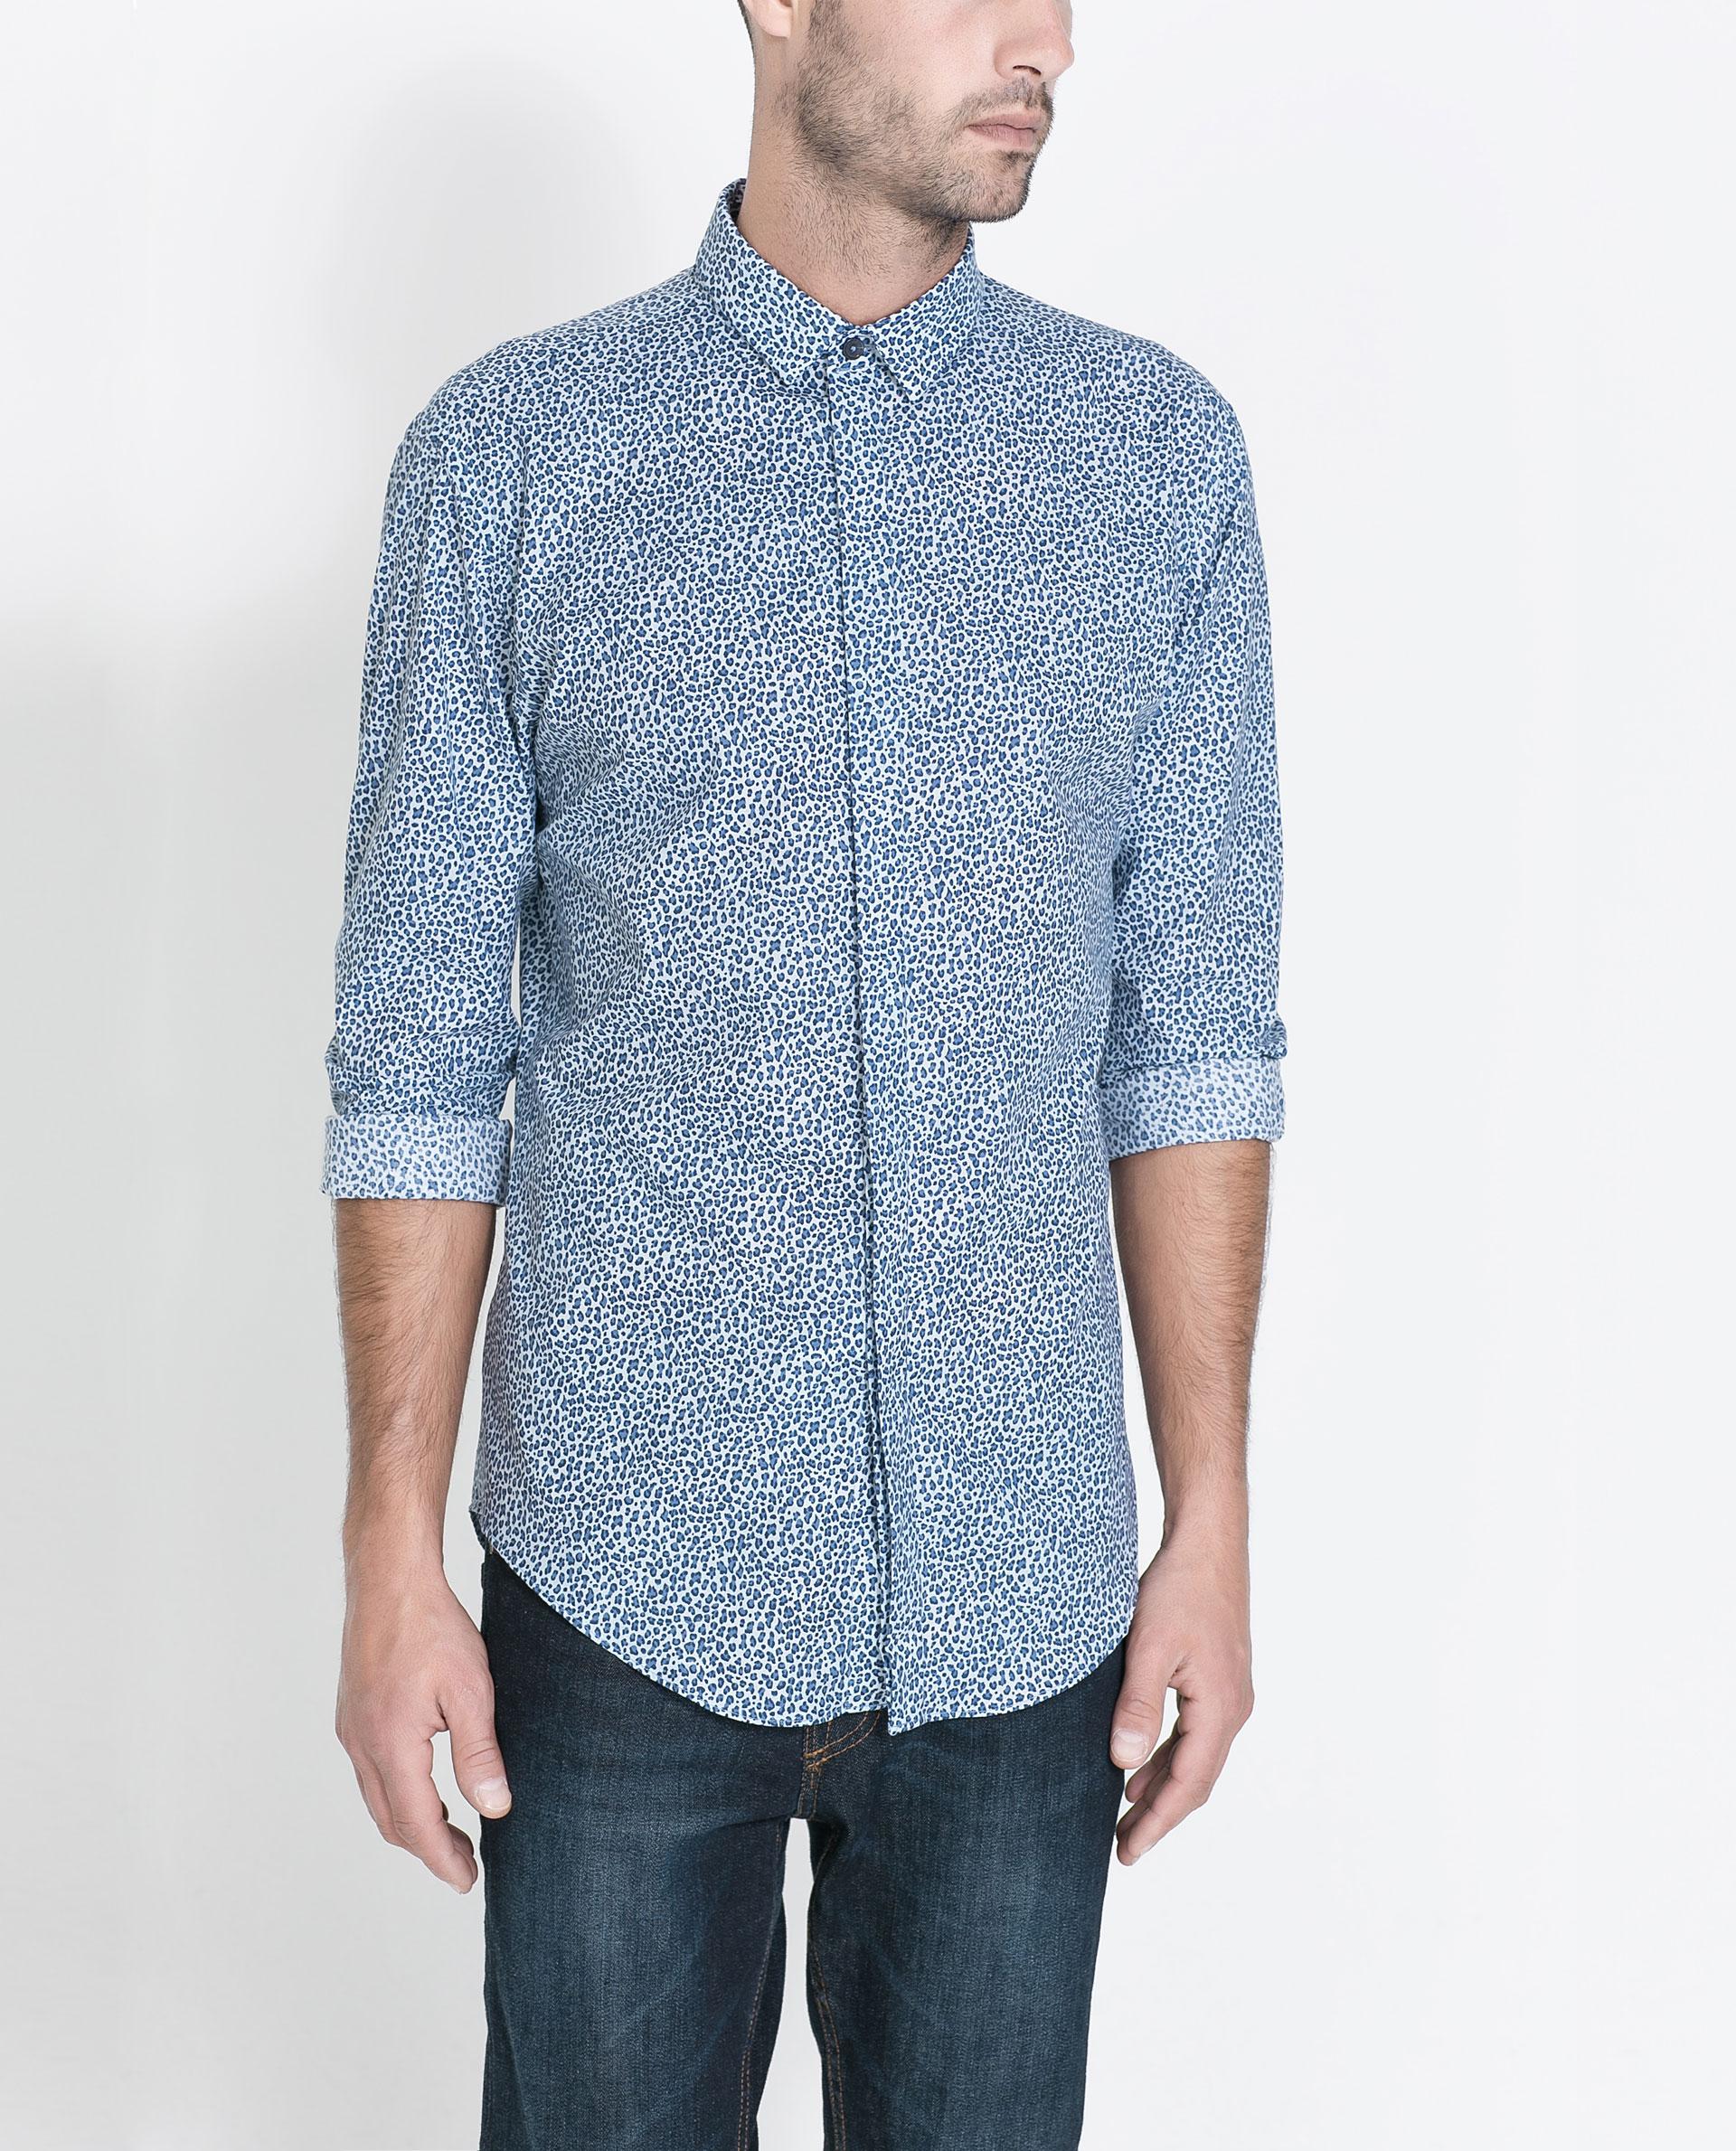 Zara animal print shirt in blue for men lyst for Zara mens shirts sale